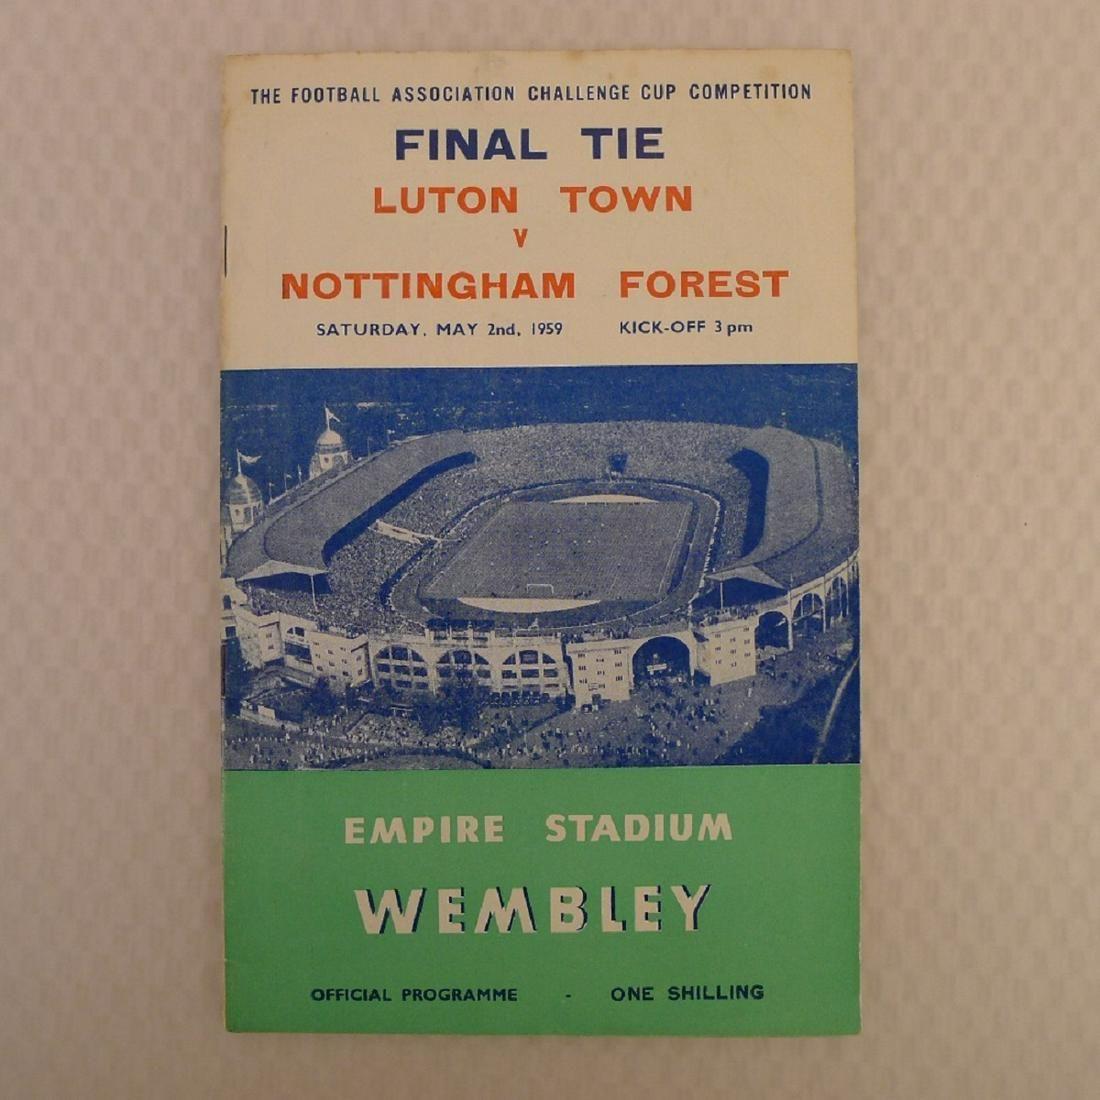 Vintage football programme. FA Cup Final 1959 - Luton